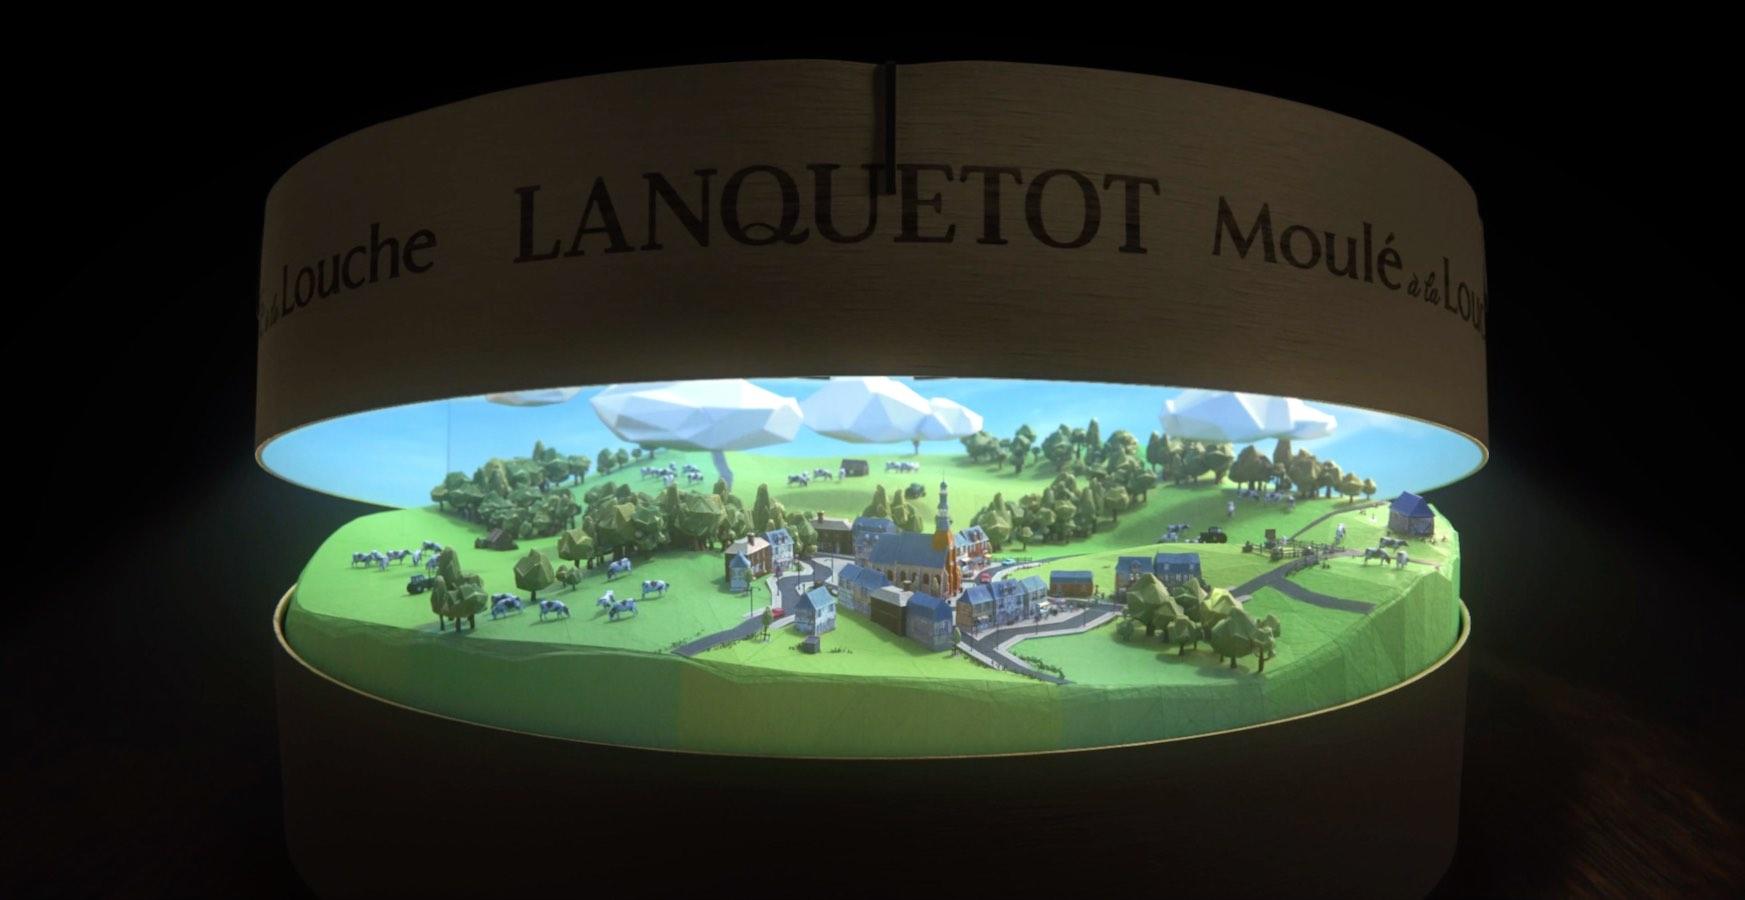 Lanquetot pub TV sponsoring billboard Notchup camembert illustration 3D